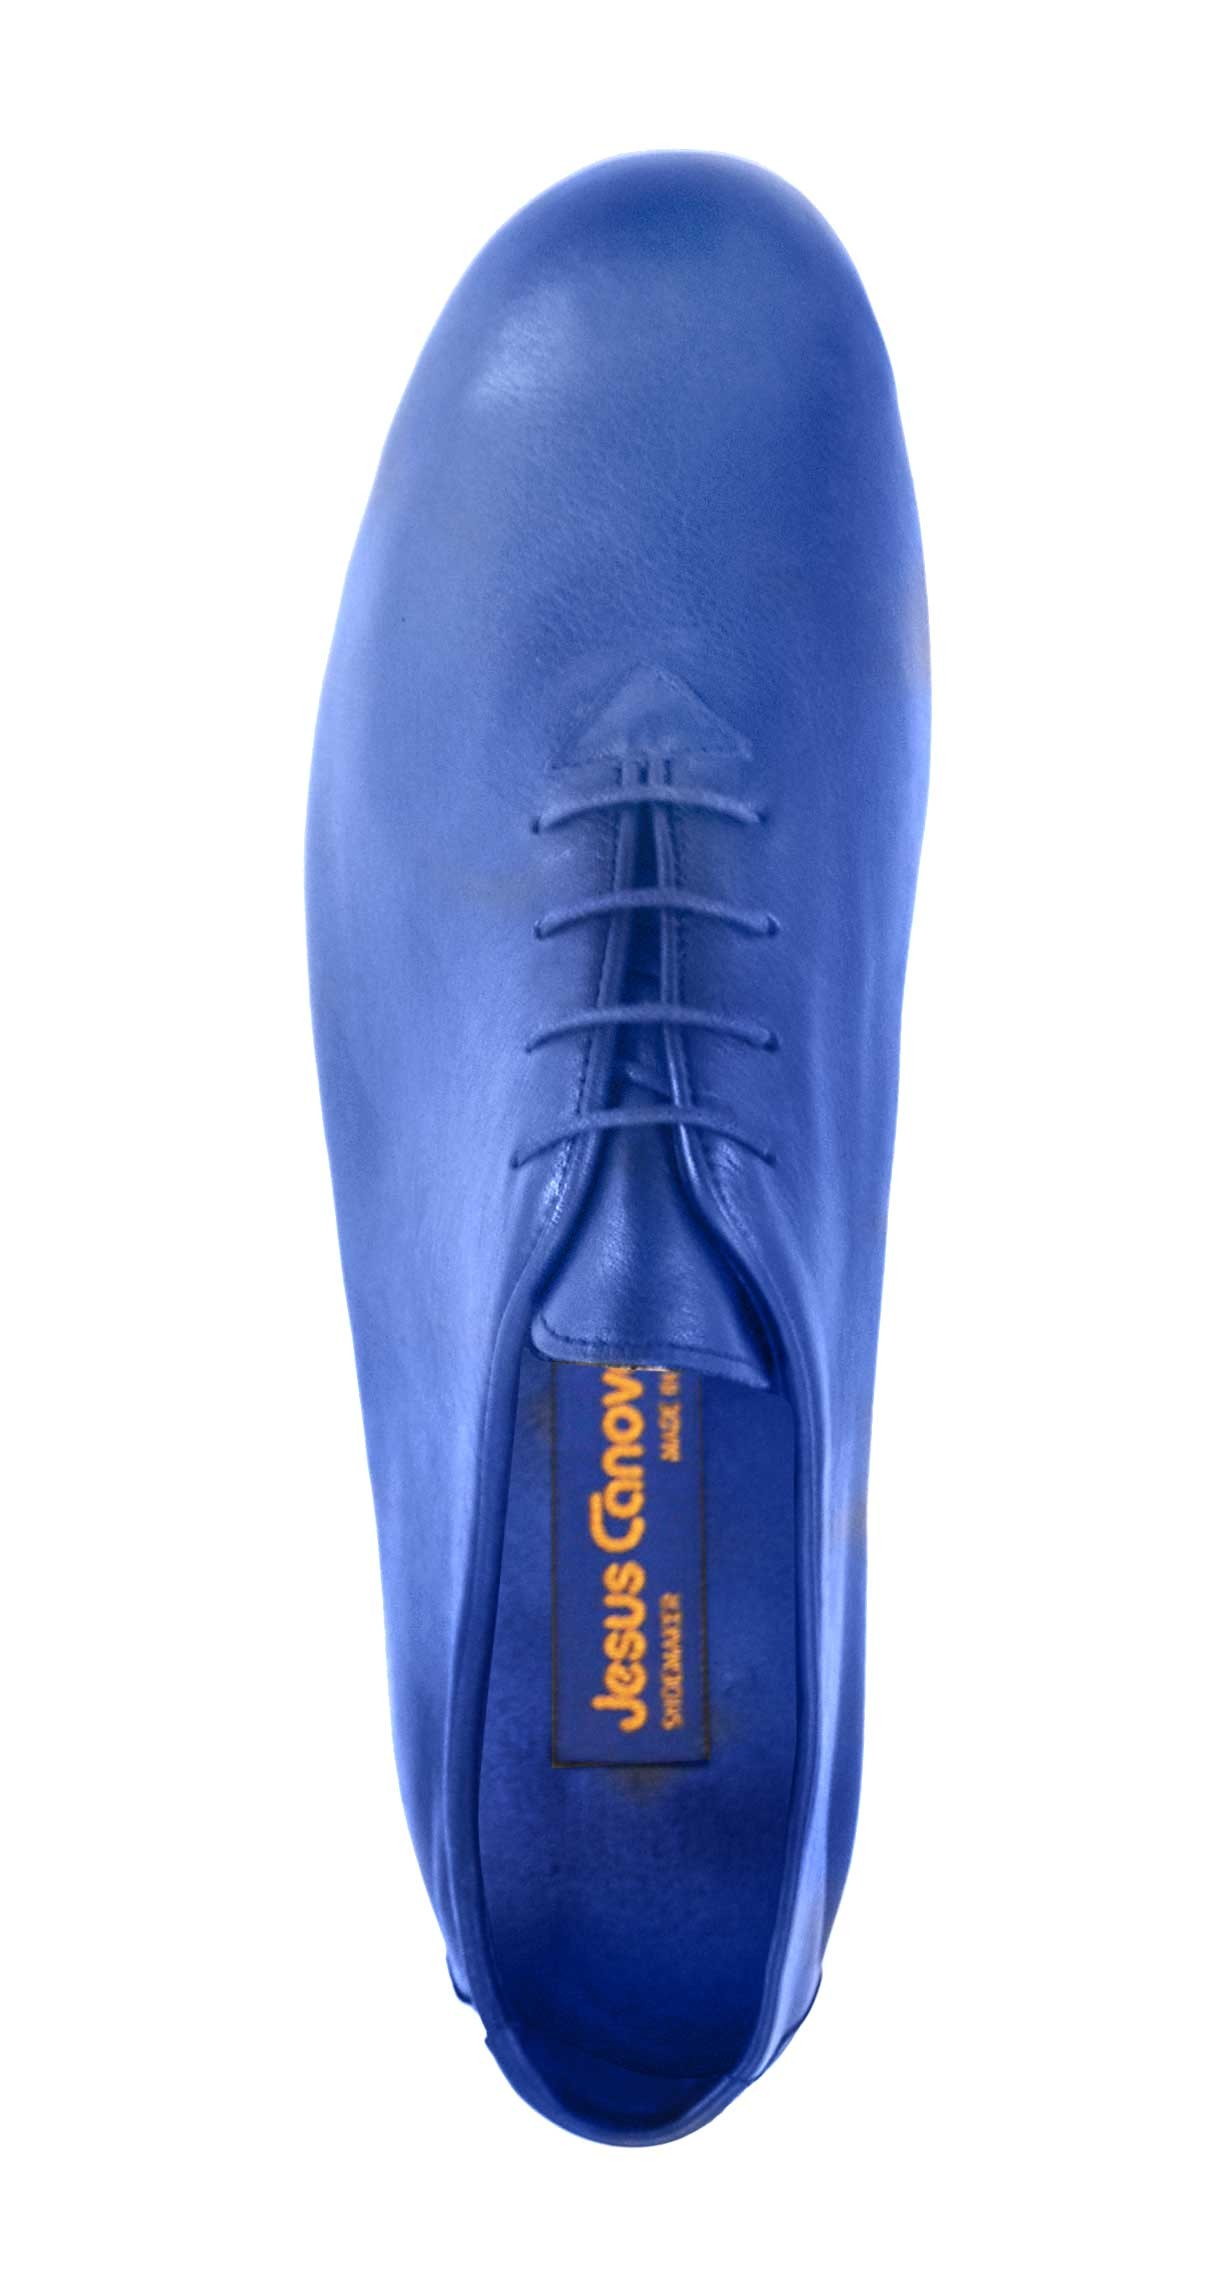 Foto 2 de Zapatos Napa Julio Iglesias Cordon Azulon